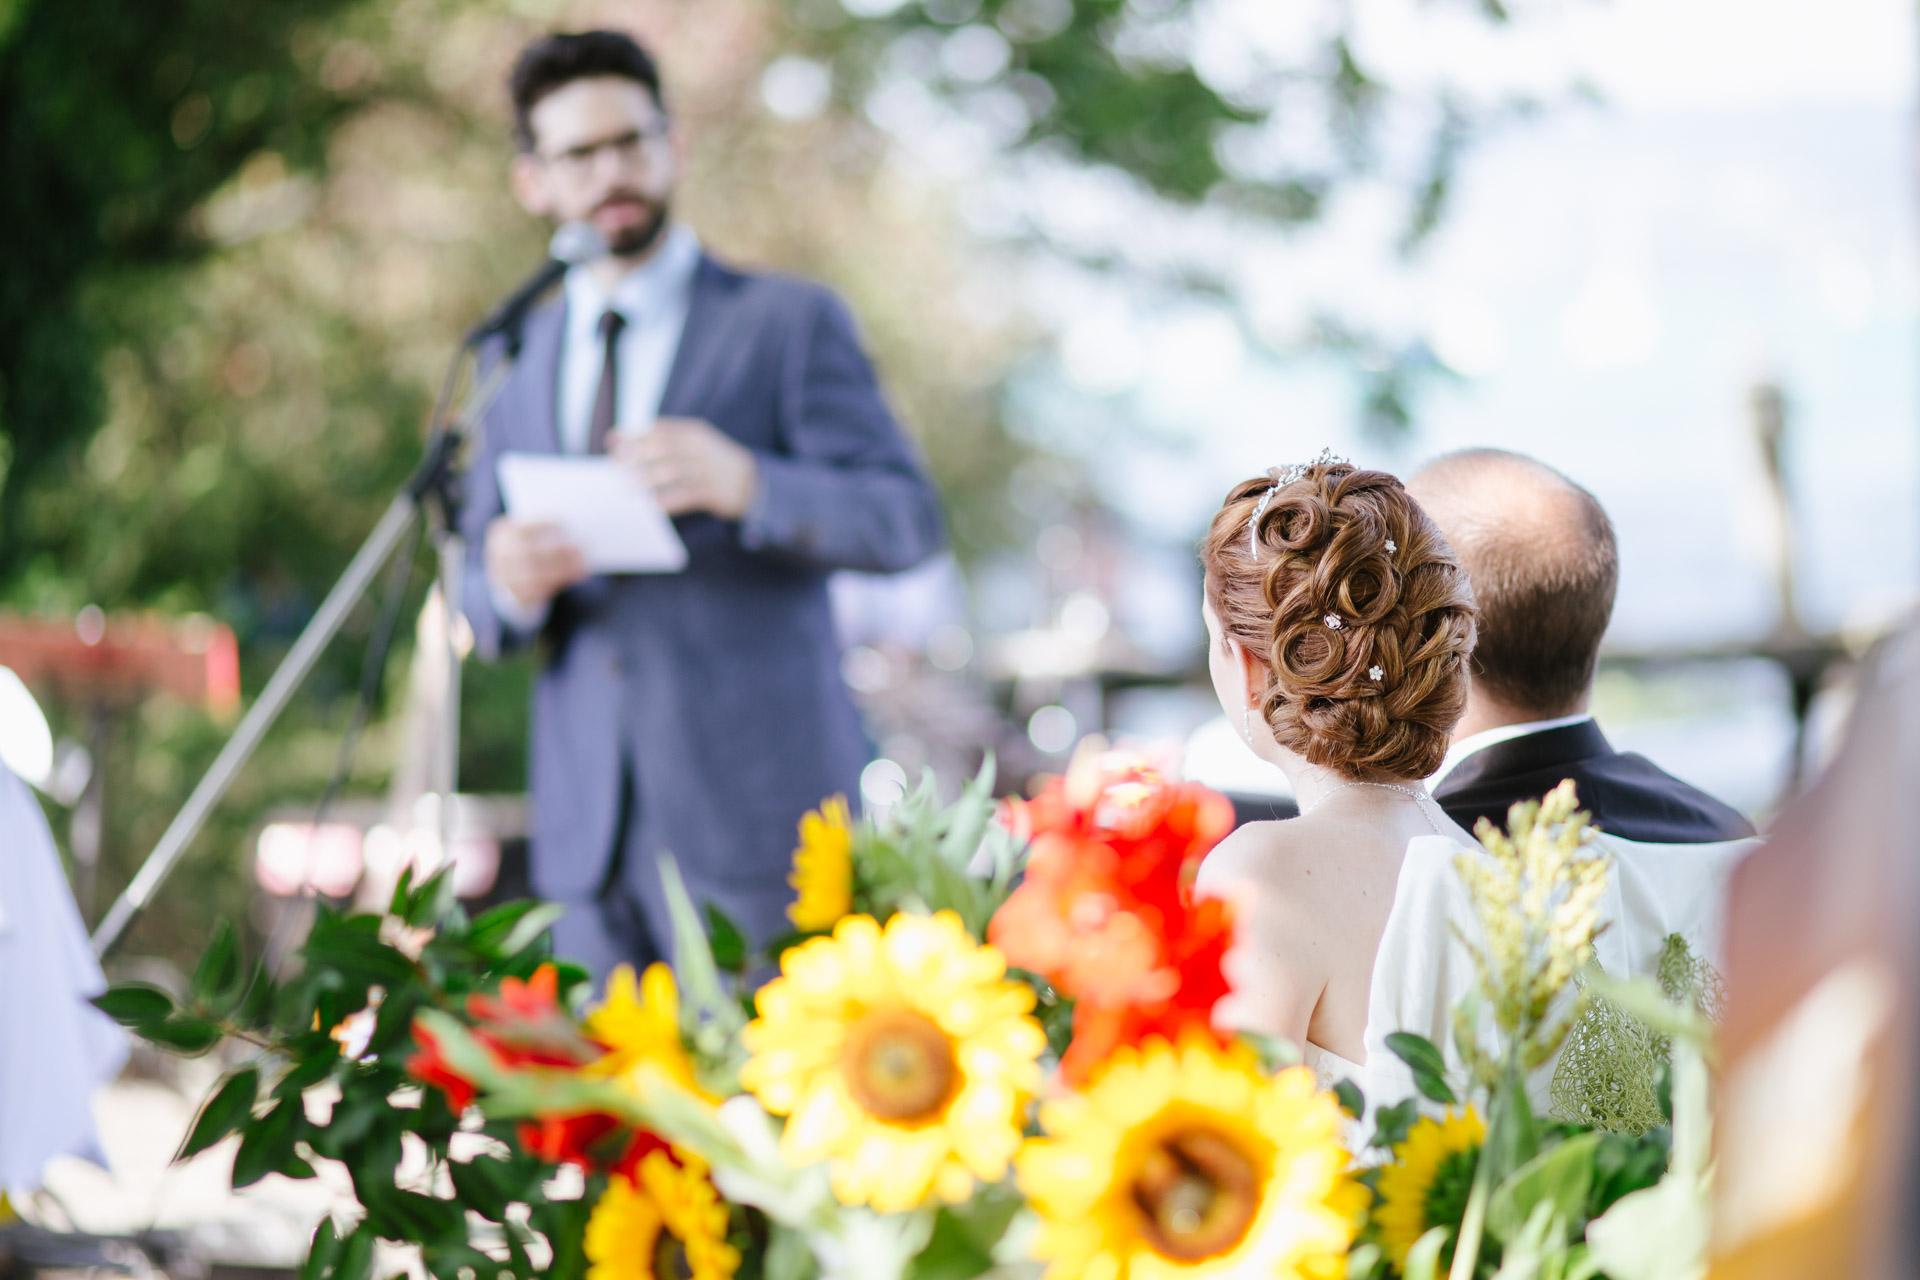 Pixelart_Hochzeitsfotografen_Loerrach_Rheinfelden_Hallwil_Schweiz_Linda-Ramon-1031